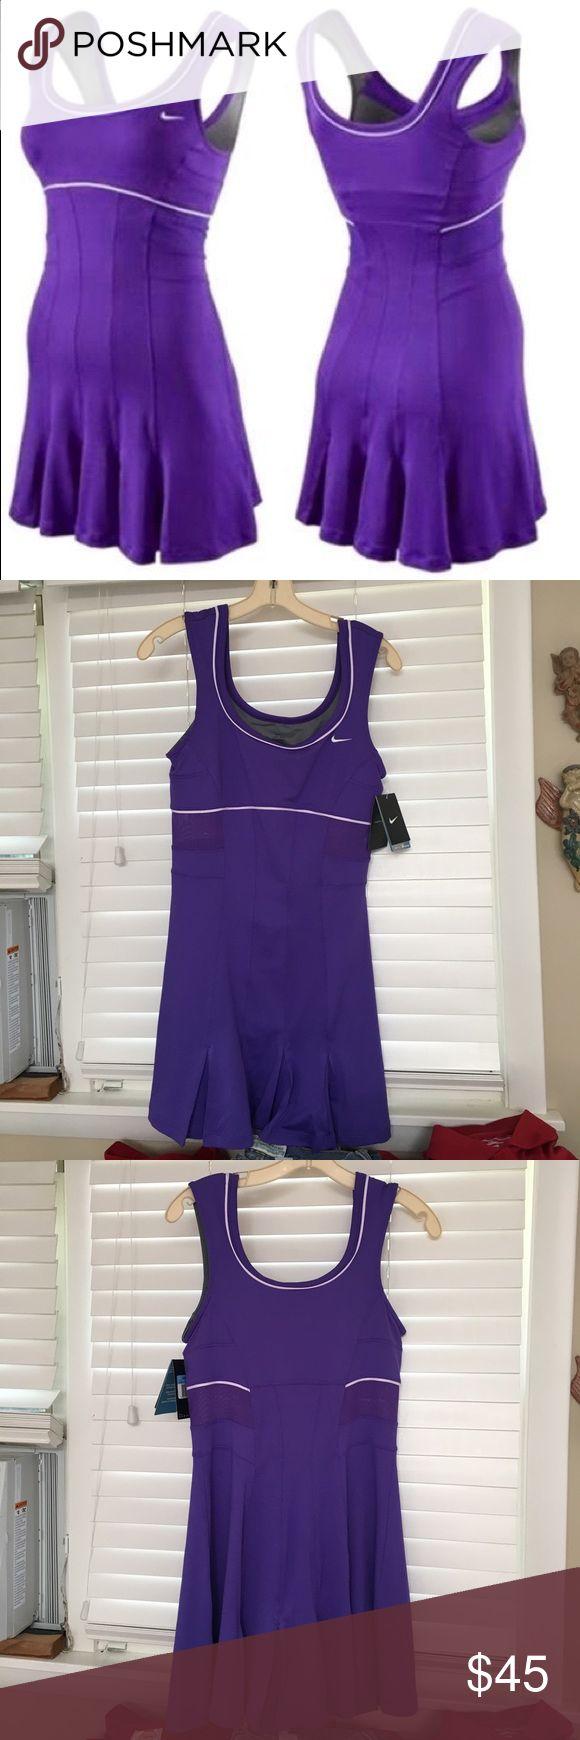 Brand New Women's Nike Dress BRAND NWT Purple Women's Nike dress. AUTHENTIC NIKE DRESS. Tags still on, built in sports bra. Nike Other